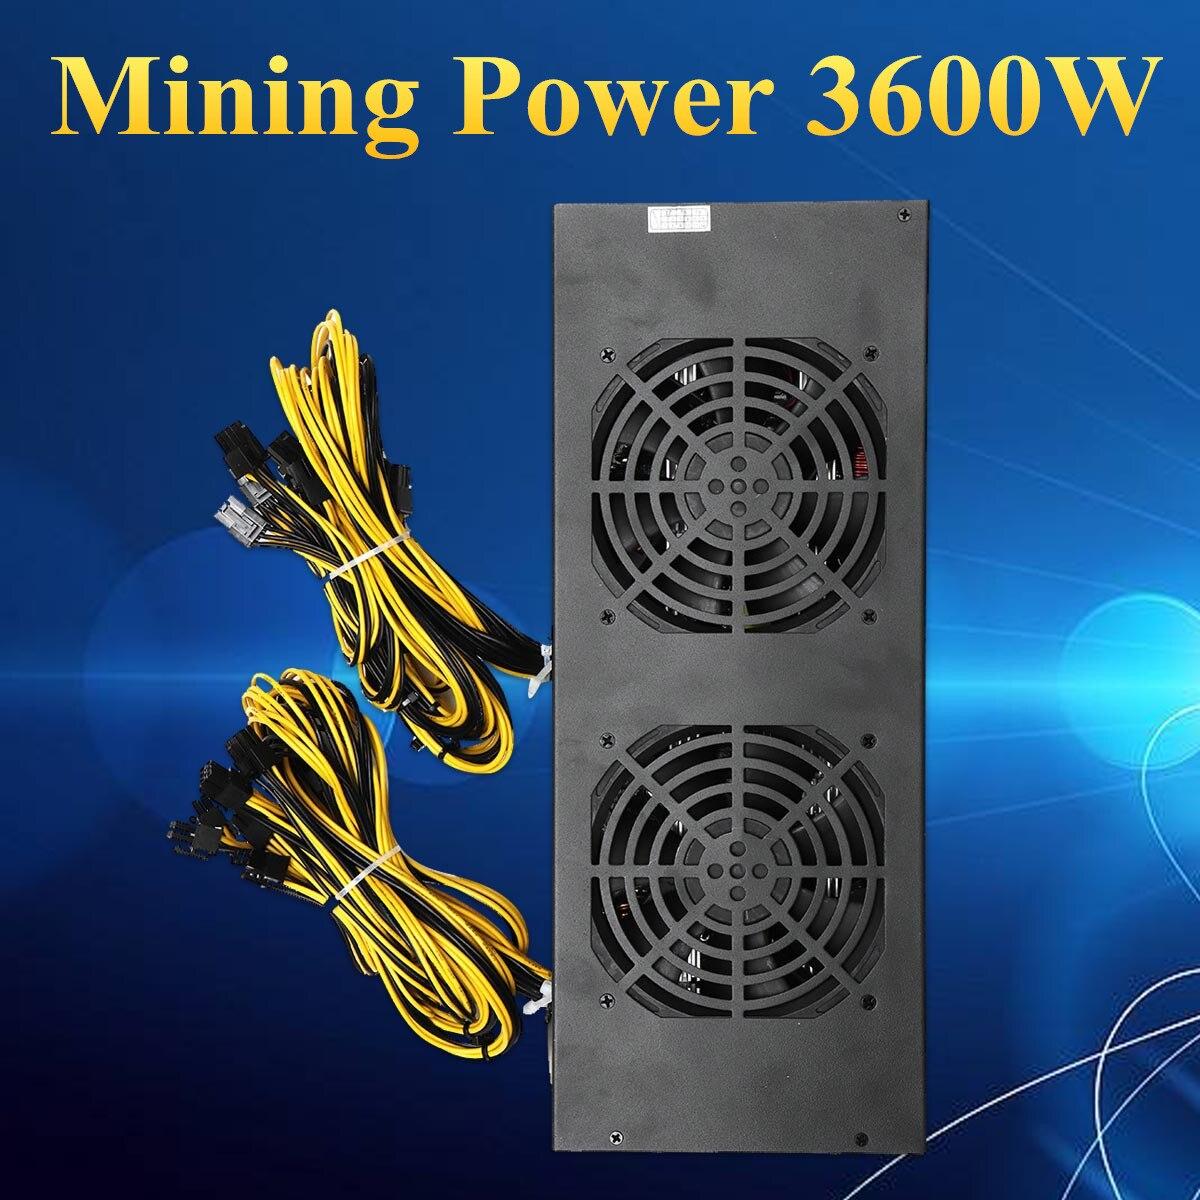 3600 W 20Pin Mining Питание Ферма для майнинга машина с четыре вентилятора для A6 A7 s5 s7 B3 E9 L3 + R4 Майнер Компьютерные блоки питания